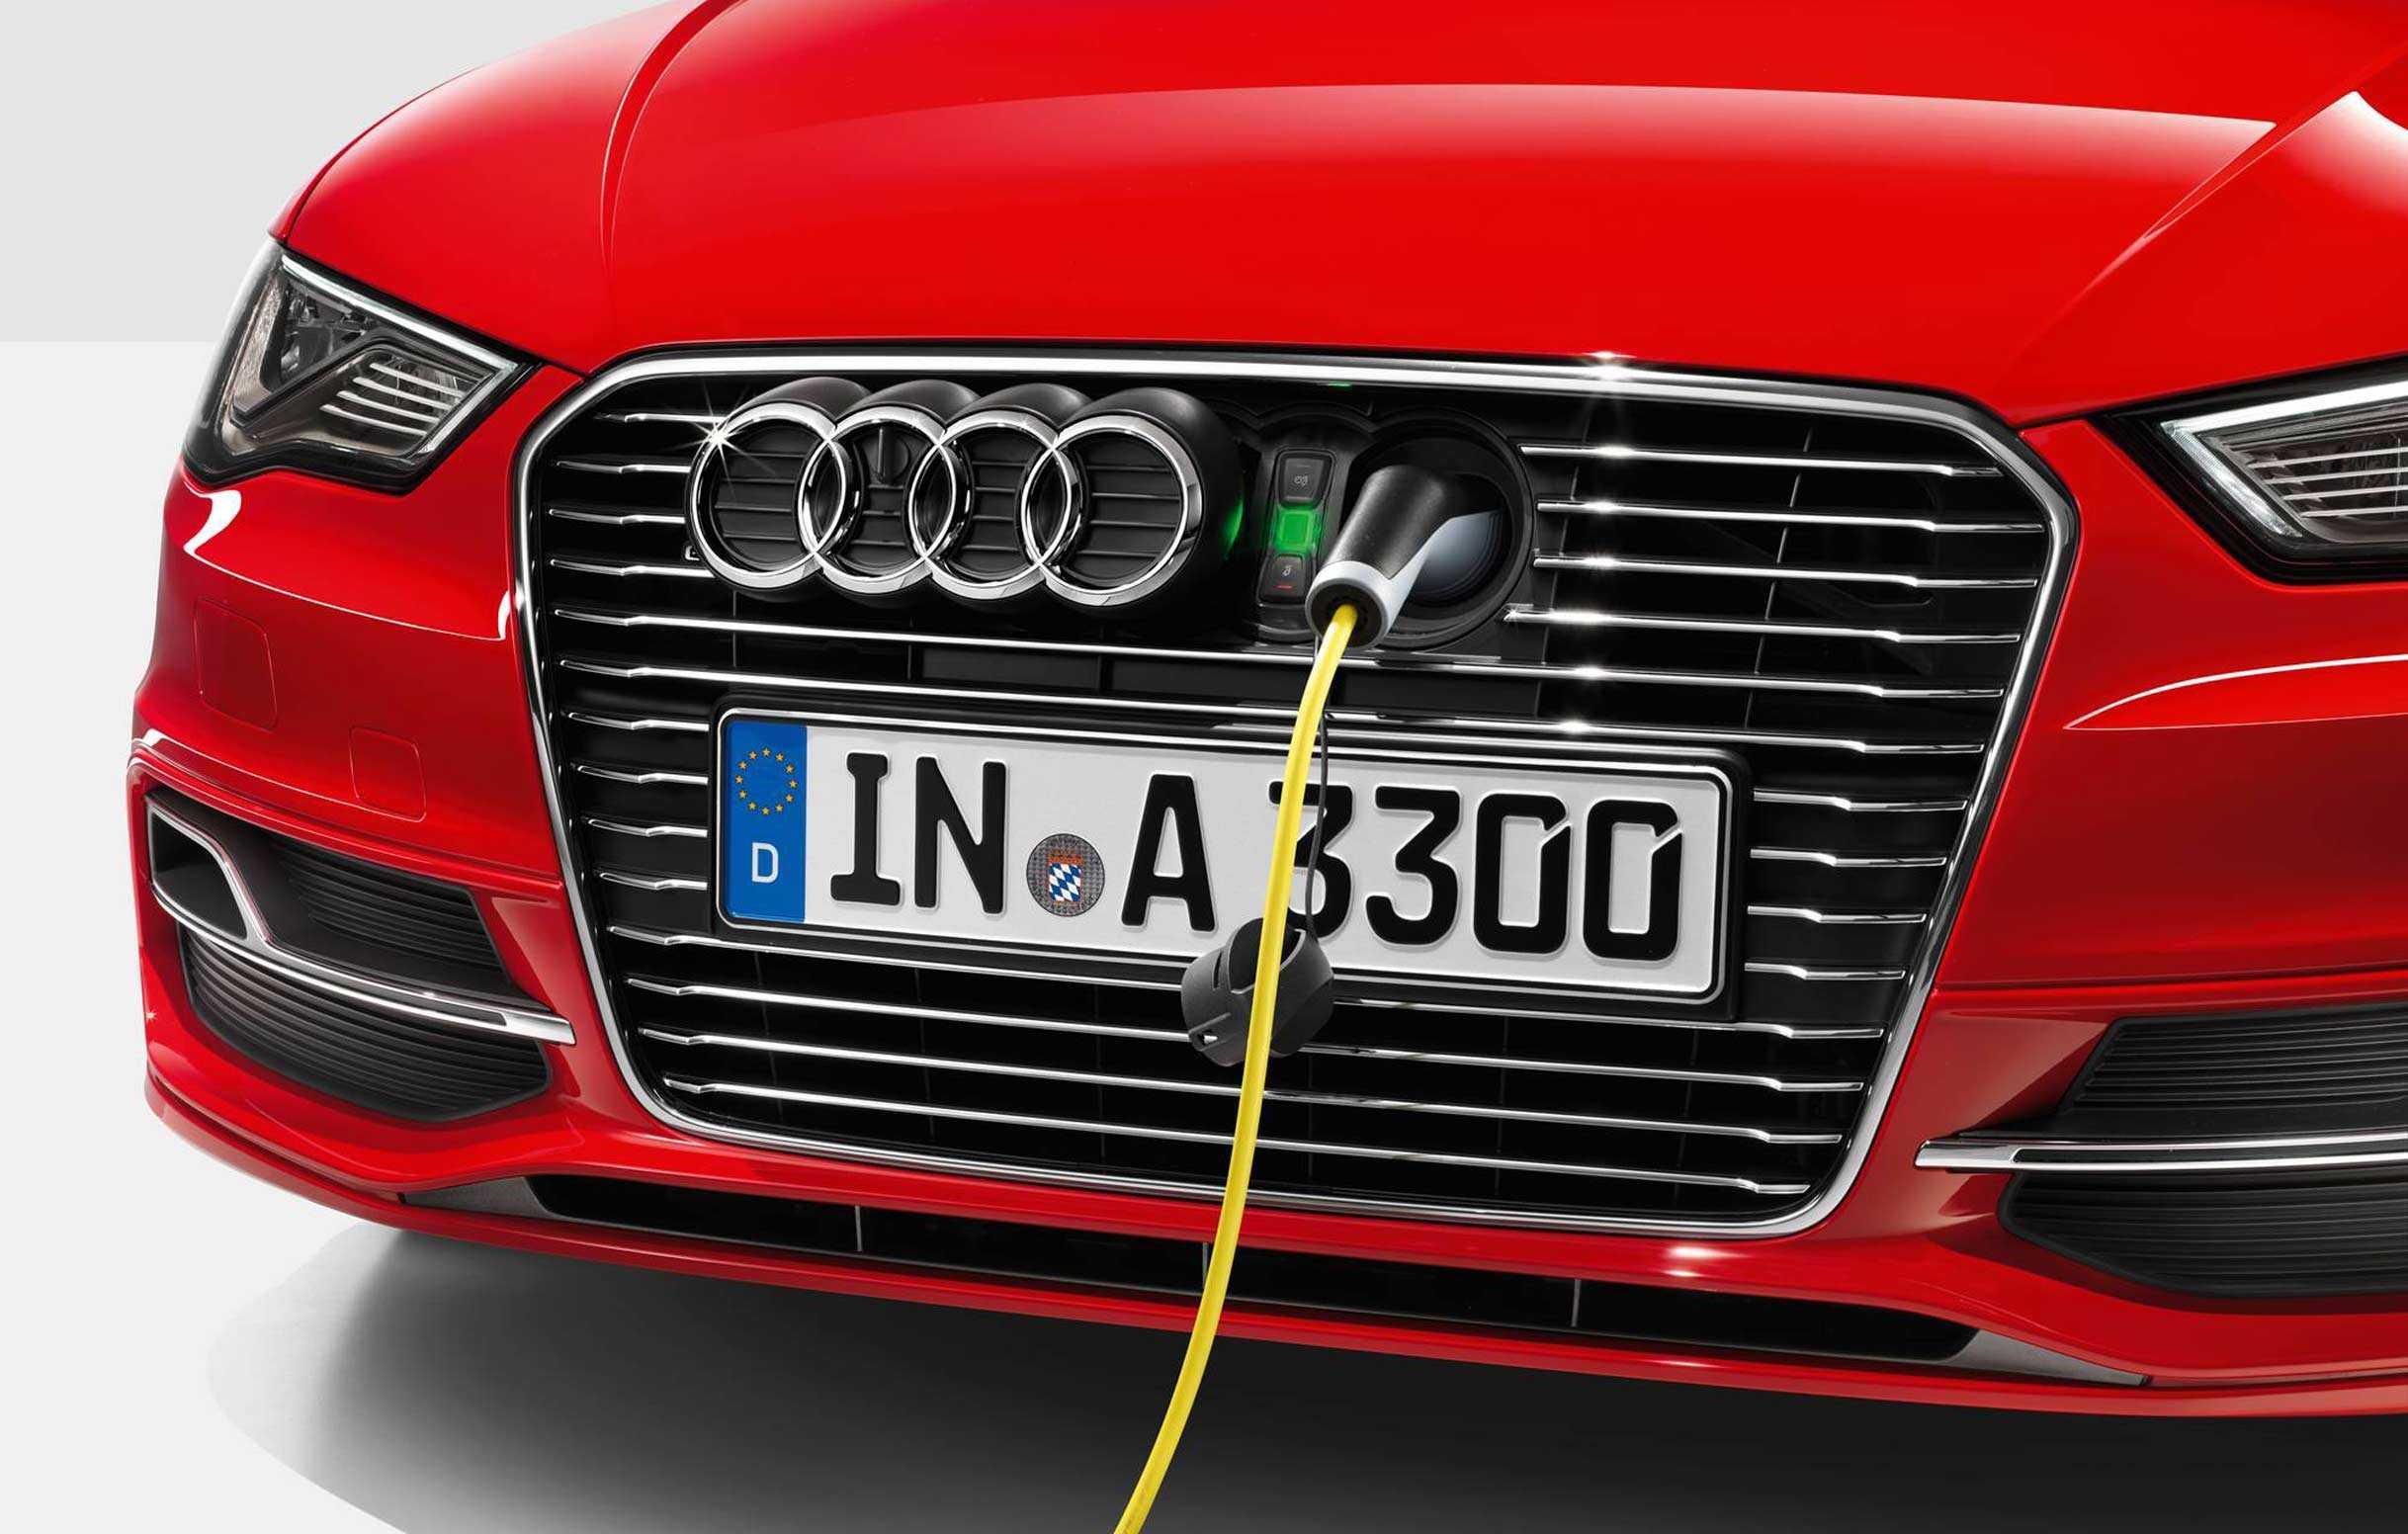 Audi A3 Sportback e-tron is a Green Vehicle albeit Low Mileage